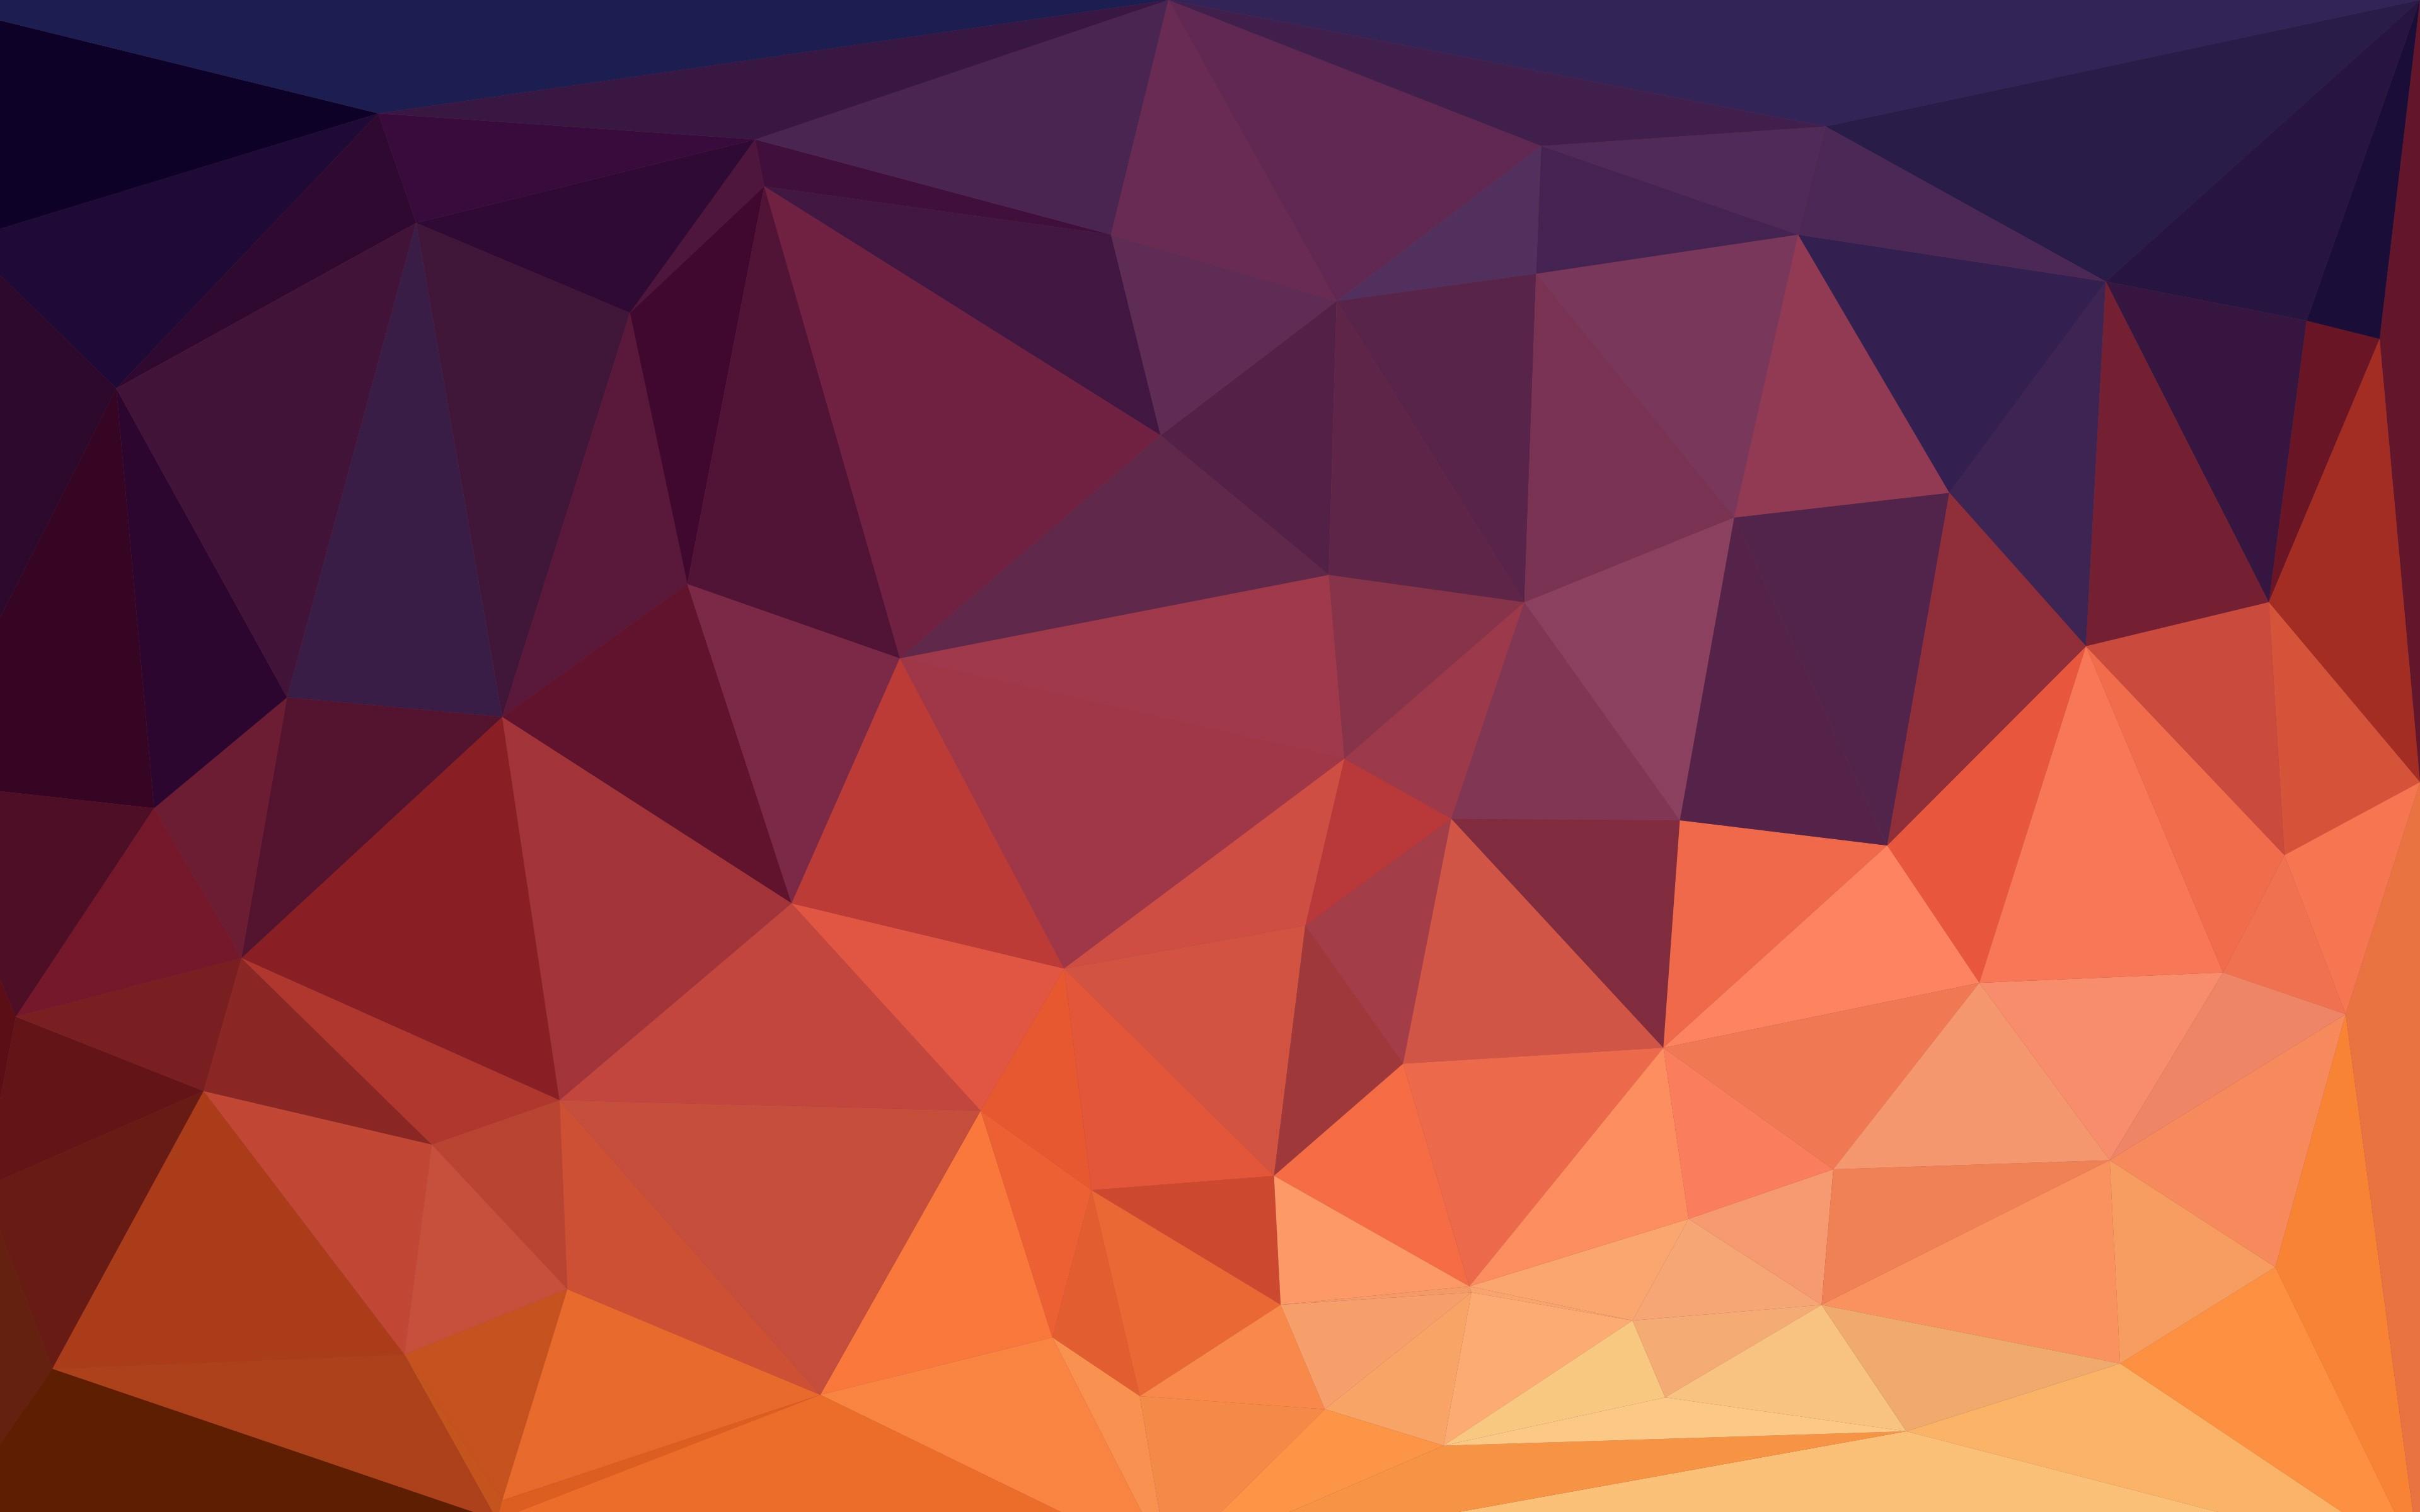 illustration minimalism low poly symmetry triangle pattern orange circle ART color shape design line computer wallpaper font 222247